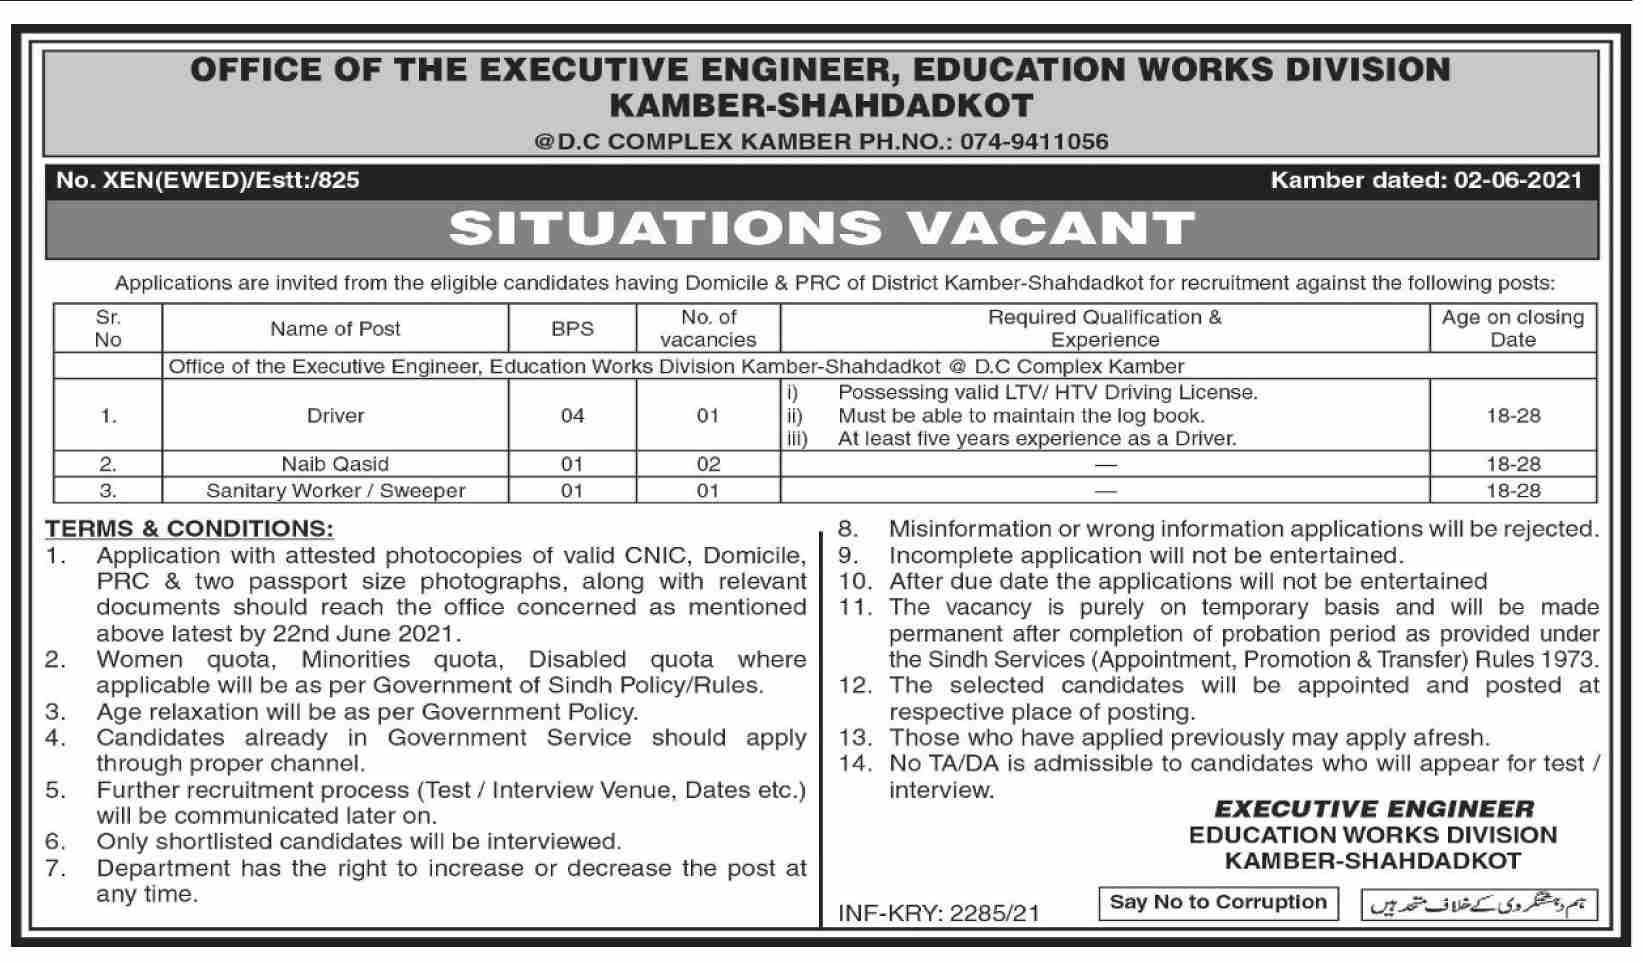 Executive Engineer Education Works Division Kamber Shahdadkot Jobs June 2021